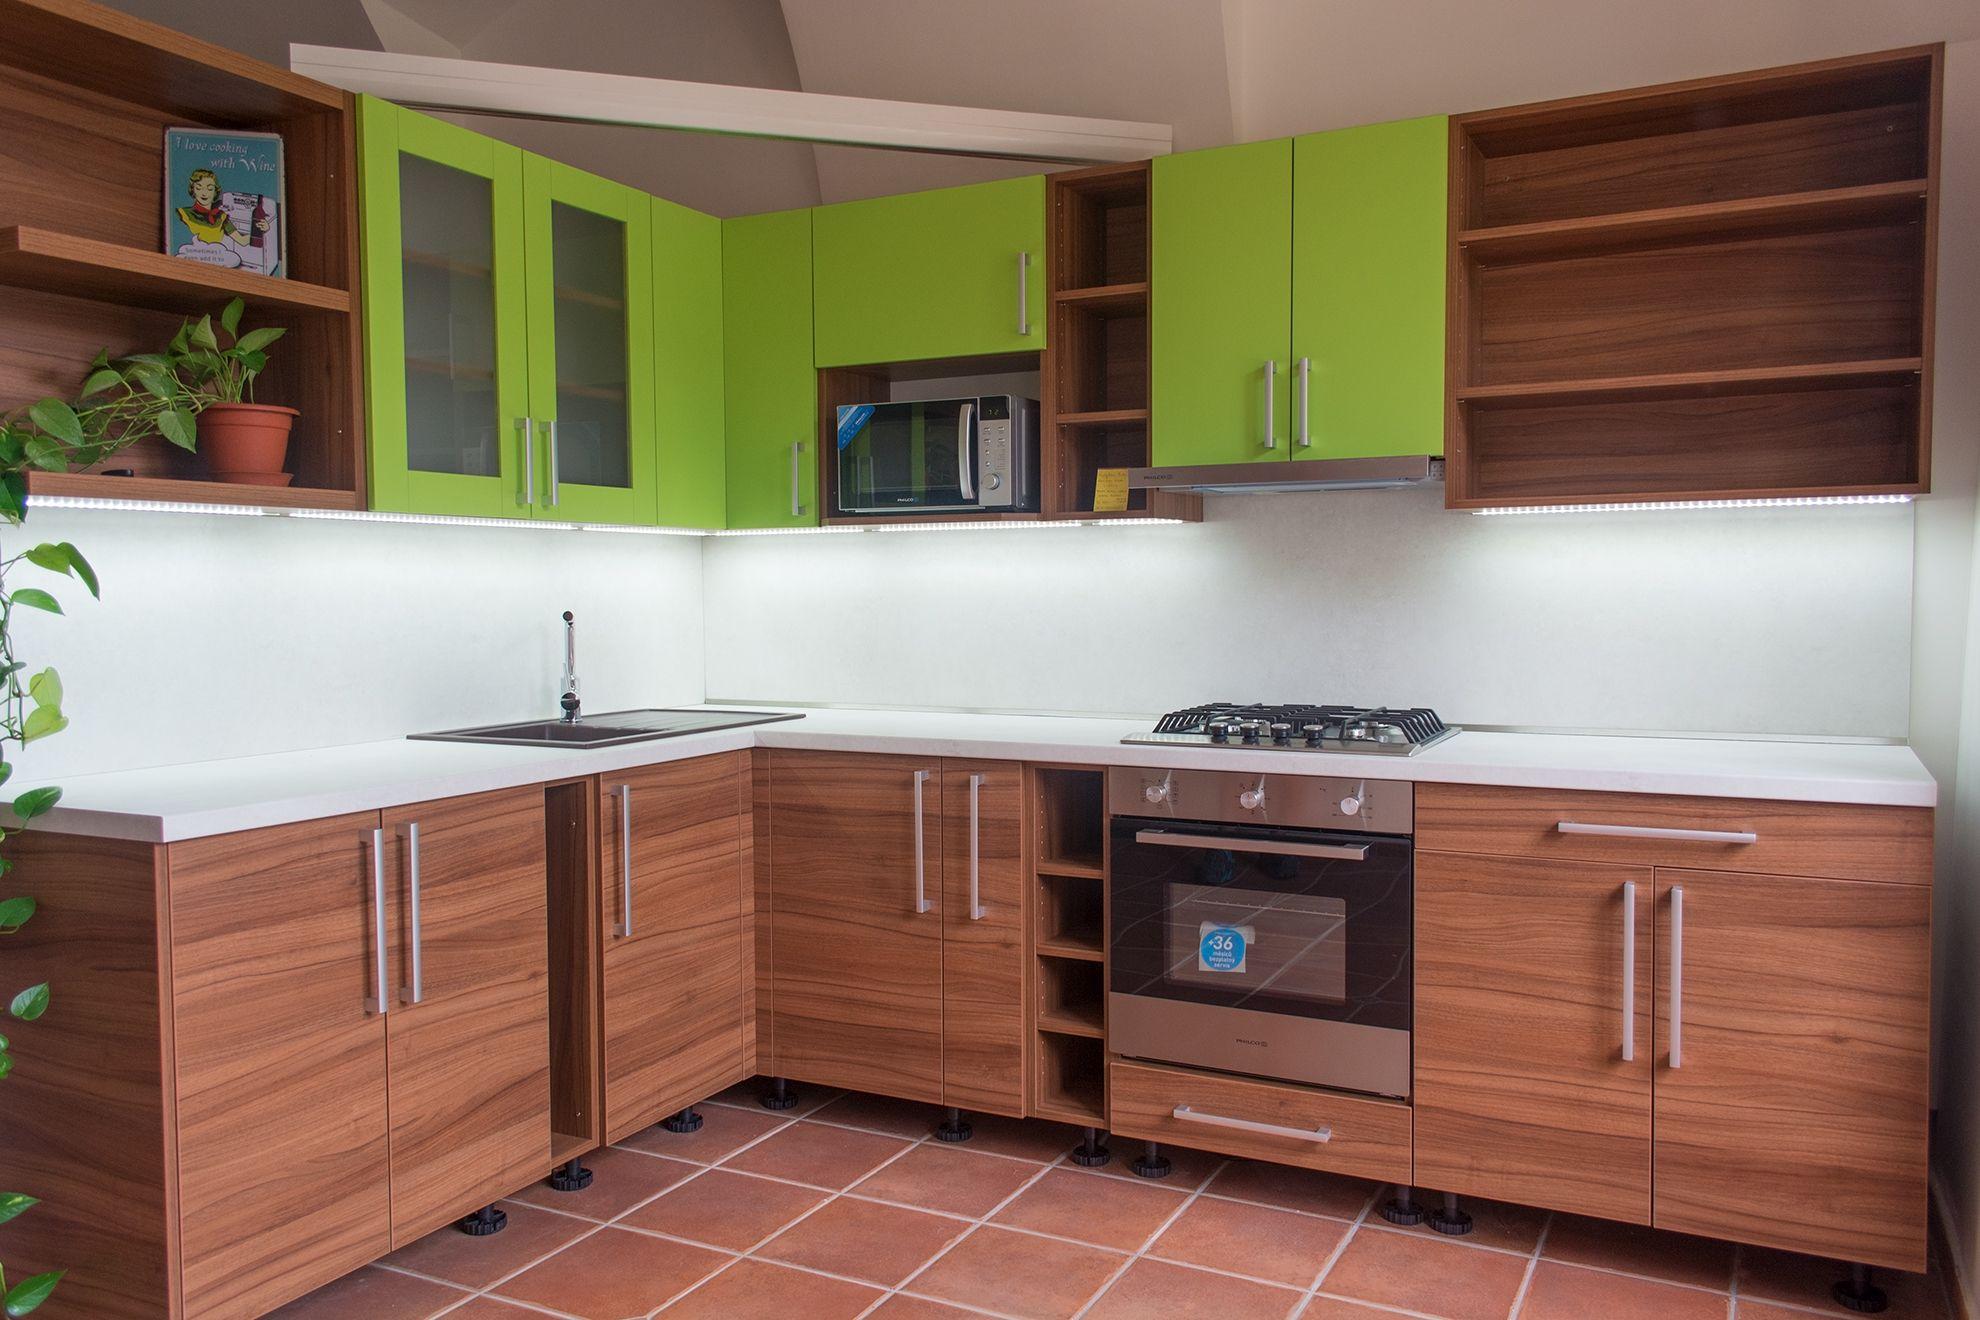 DSC 0186 - Kuchyňské studio